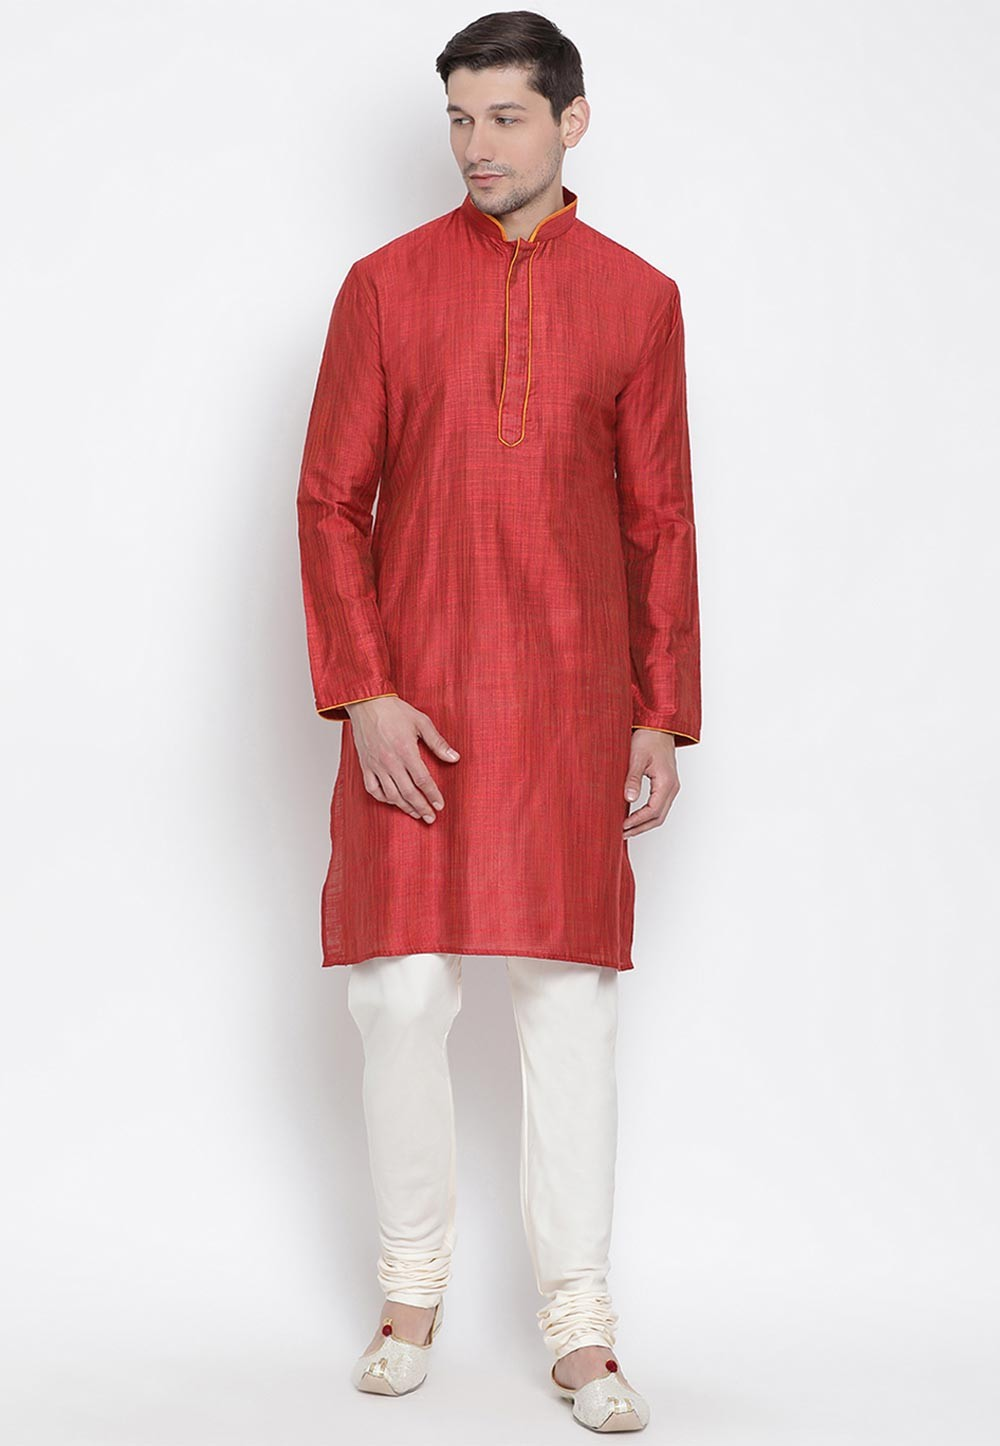 Maroon Colour Cotton Designer Kurta Pyjama.